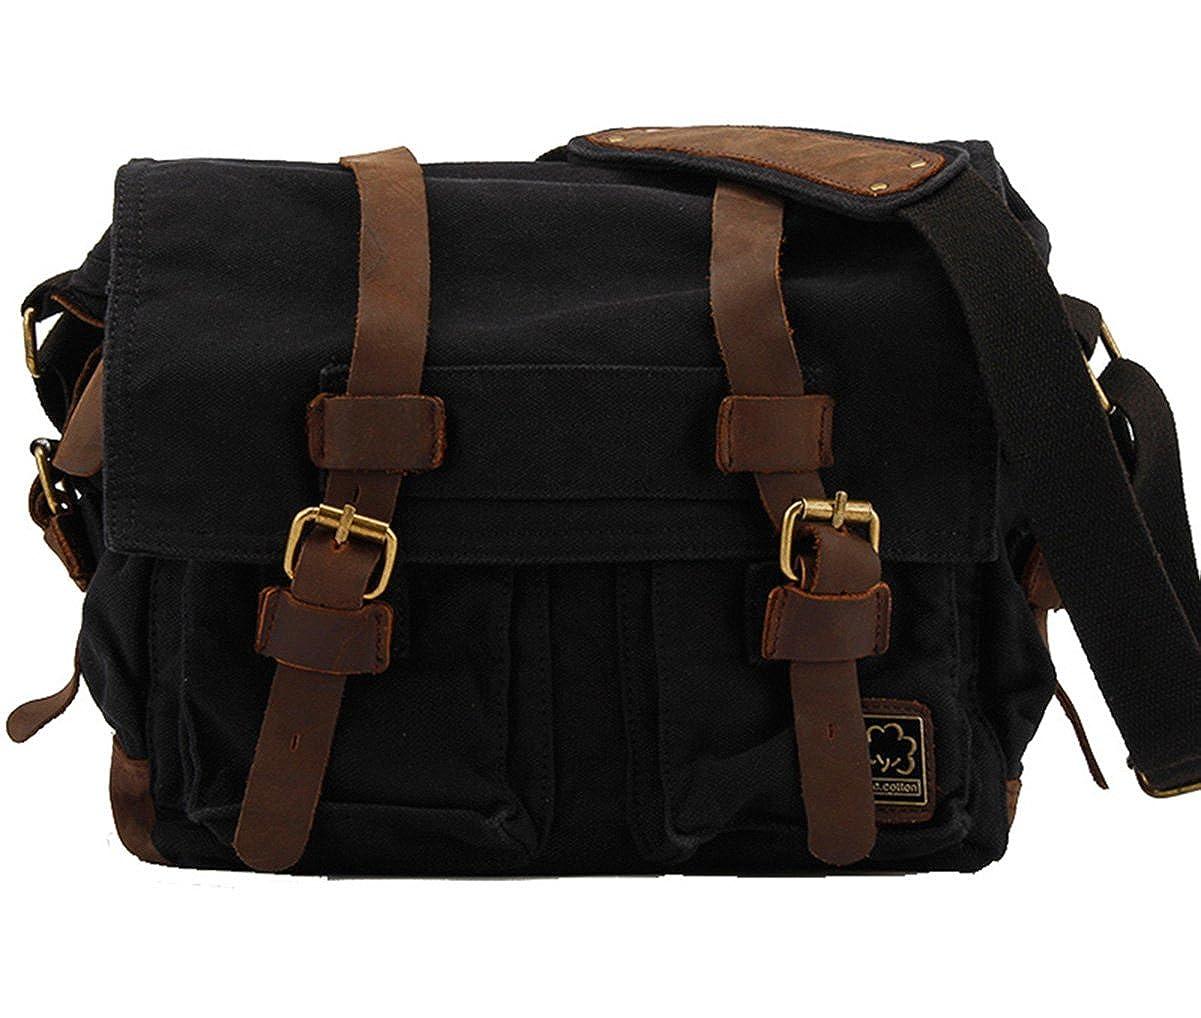 Genda 2Archer Retro Canvas Messenger Bag for Men and Women